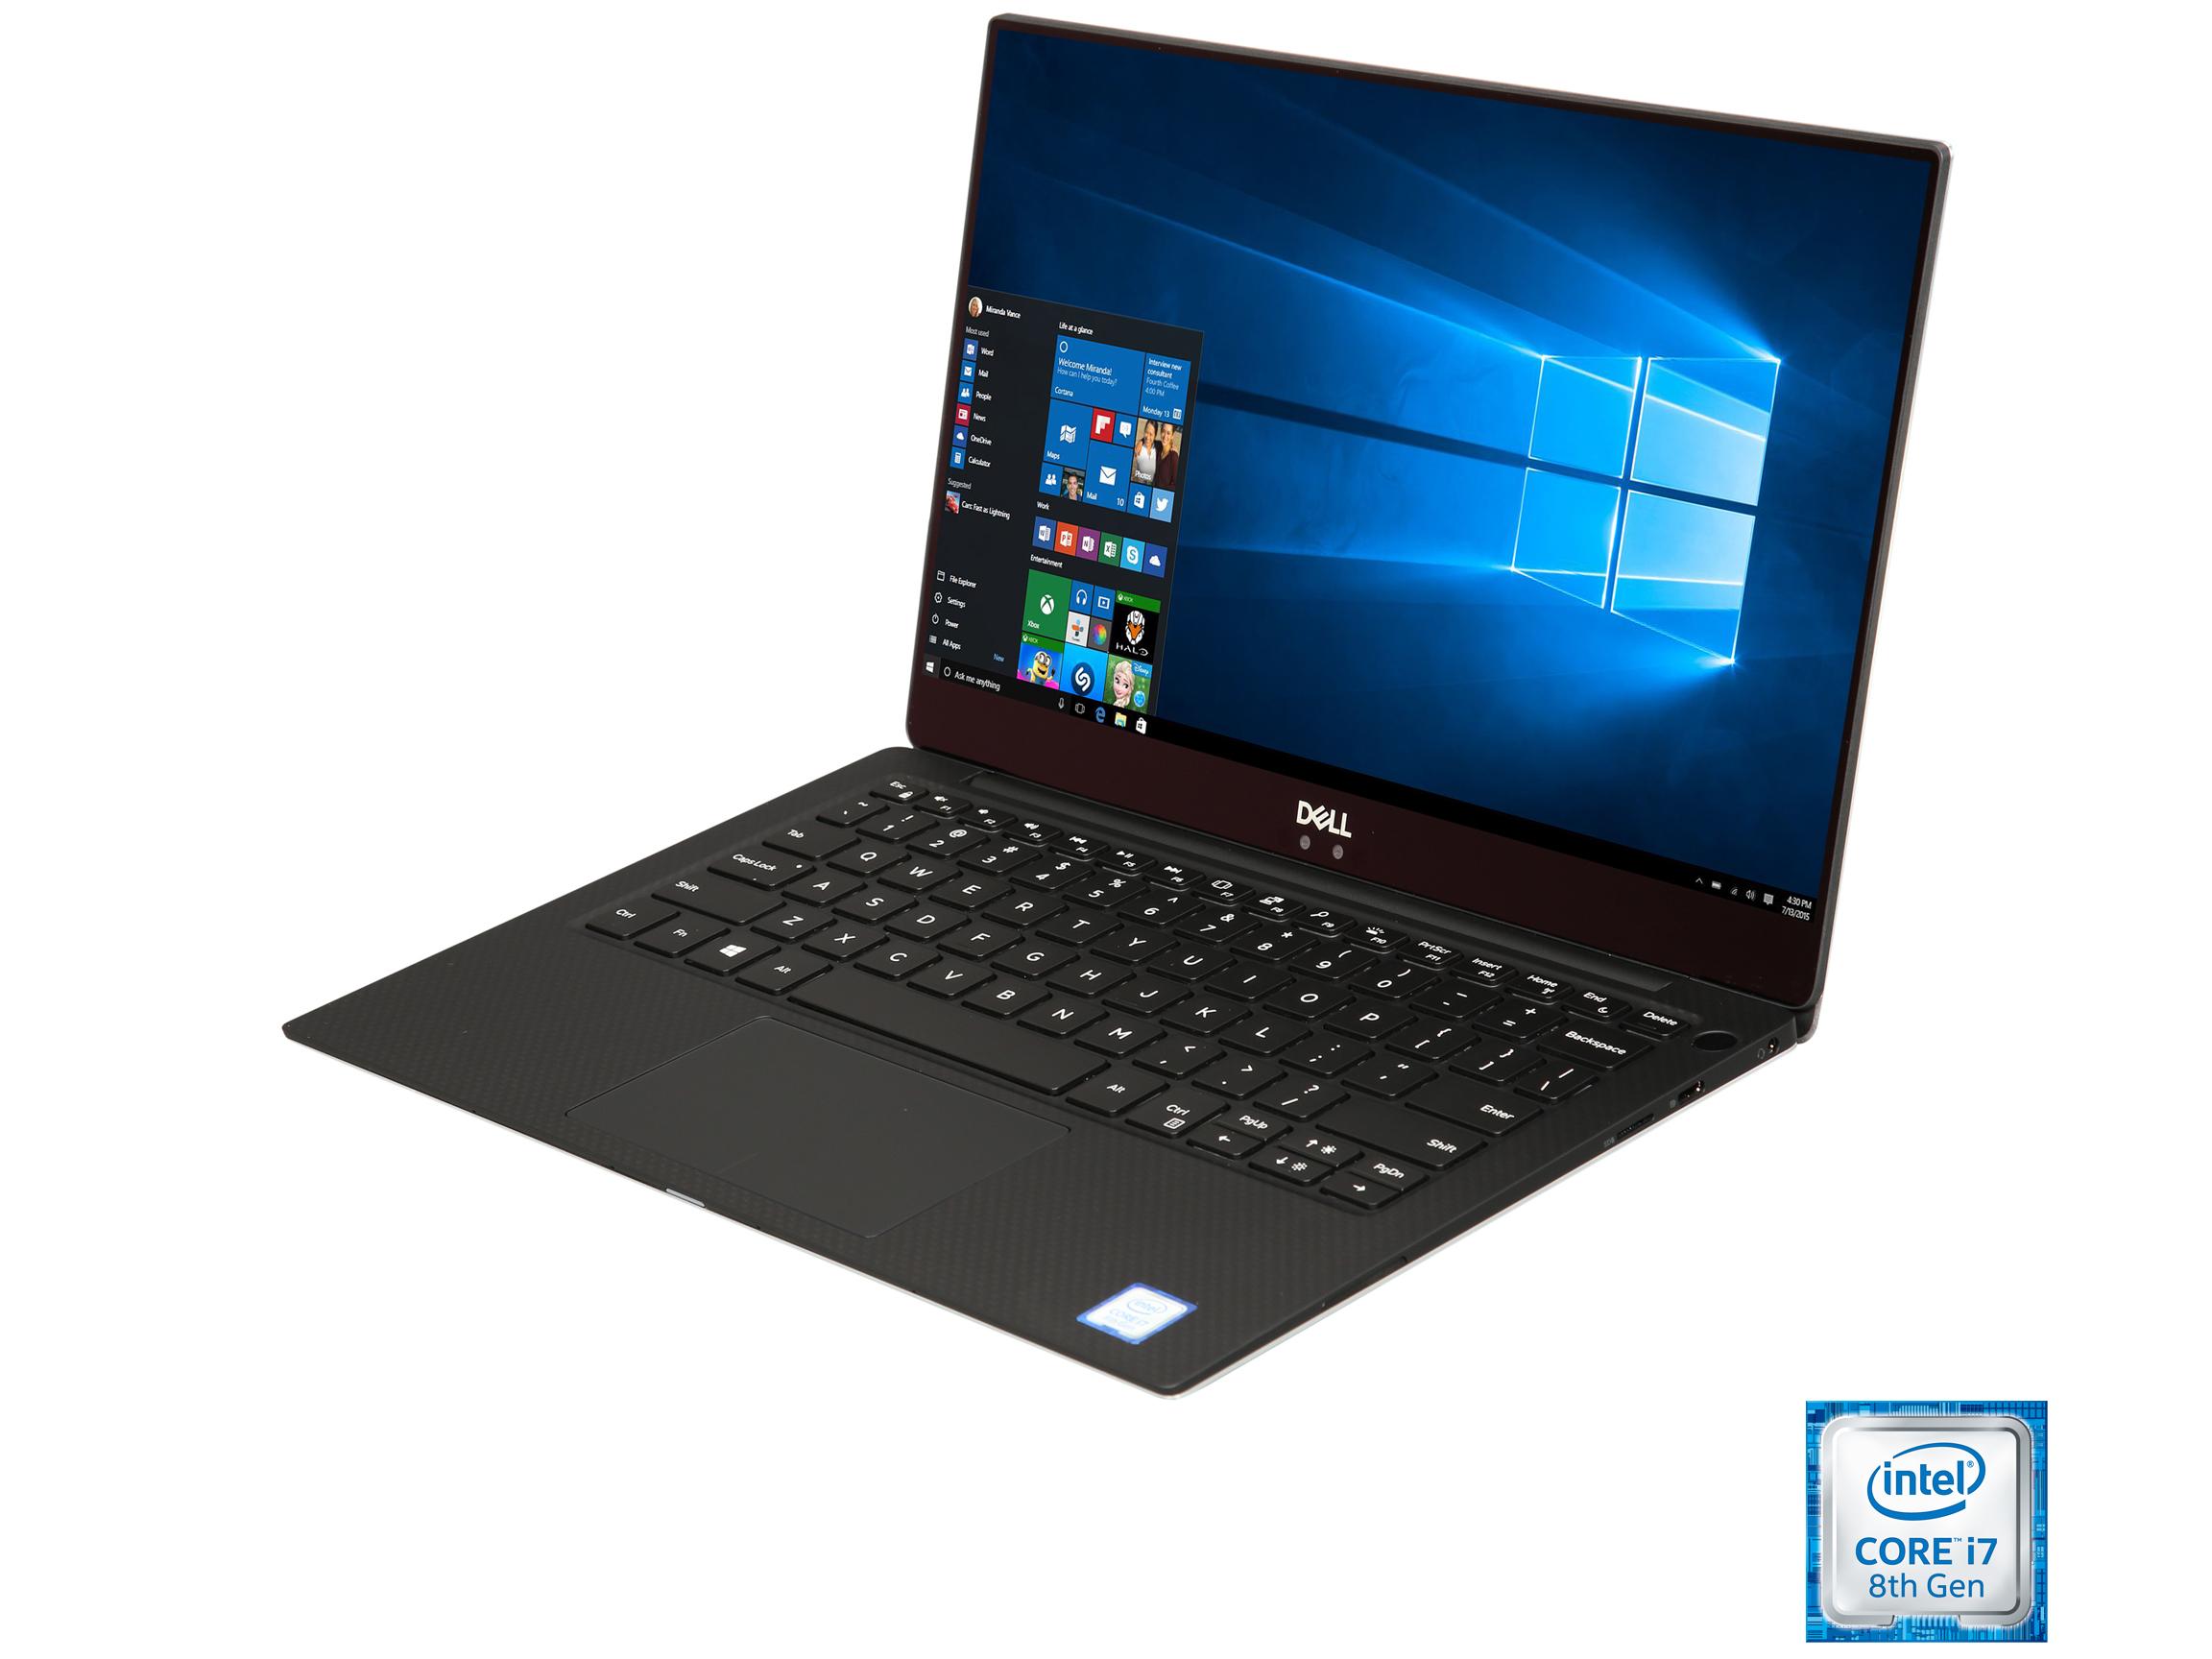 "DELL XPS XPS9370-7002SLV Intel Core i7 8th Gen 8550U 8GB RAM 256GB SSD 13.3"" Win10 $899.99 + Free Shipping"